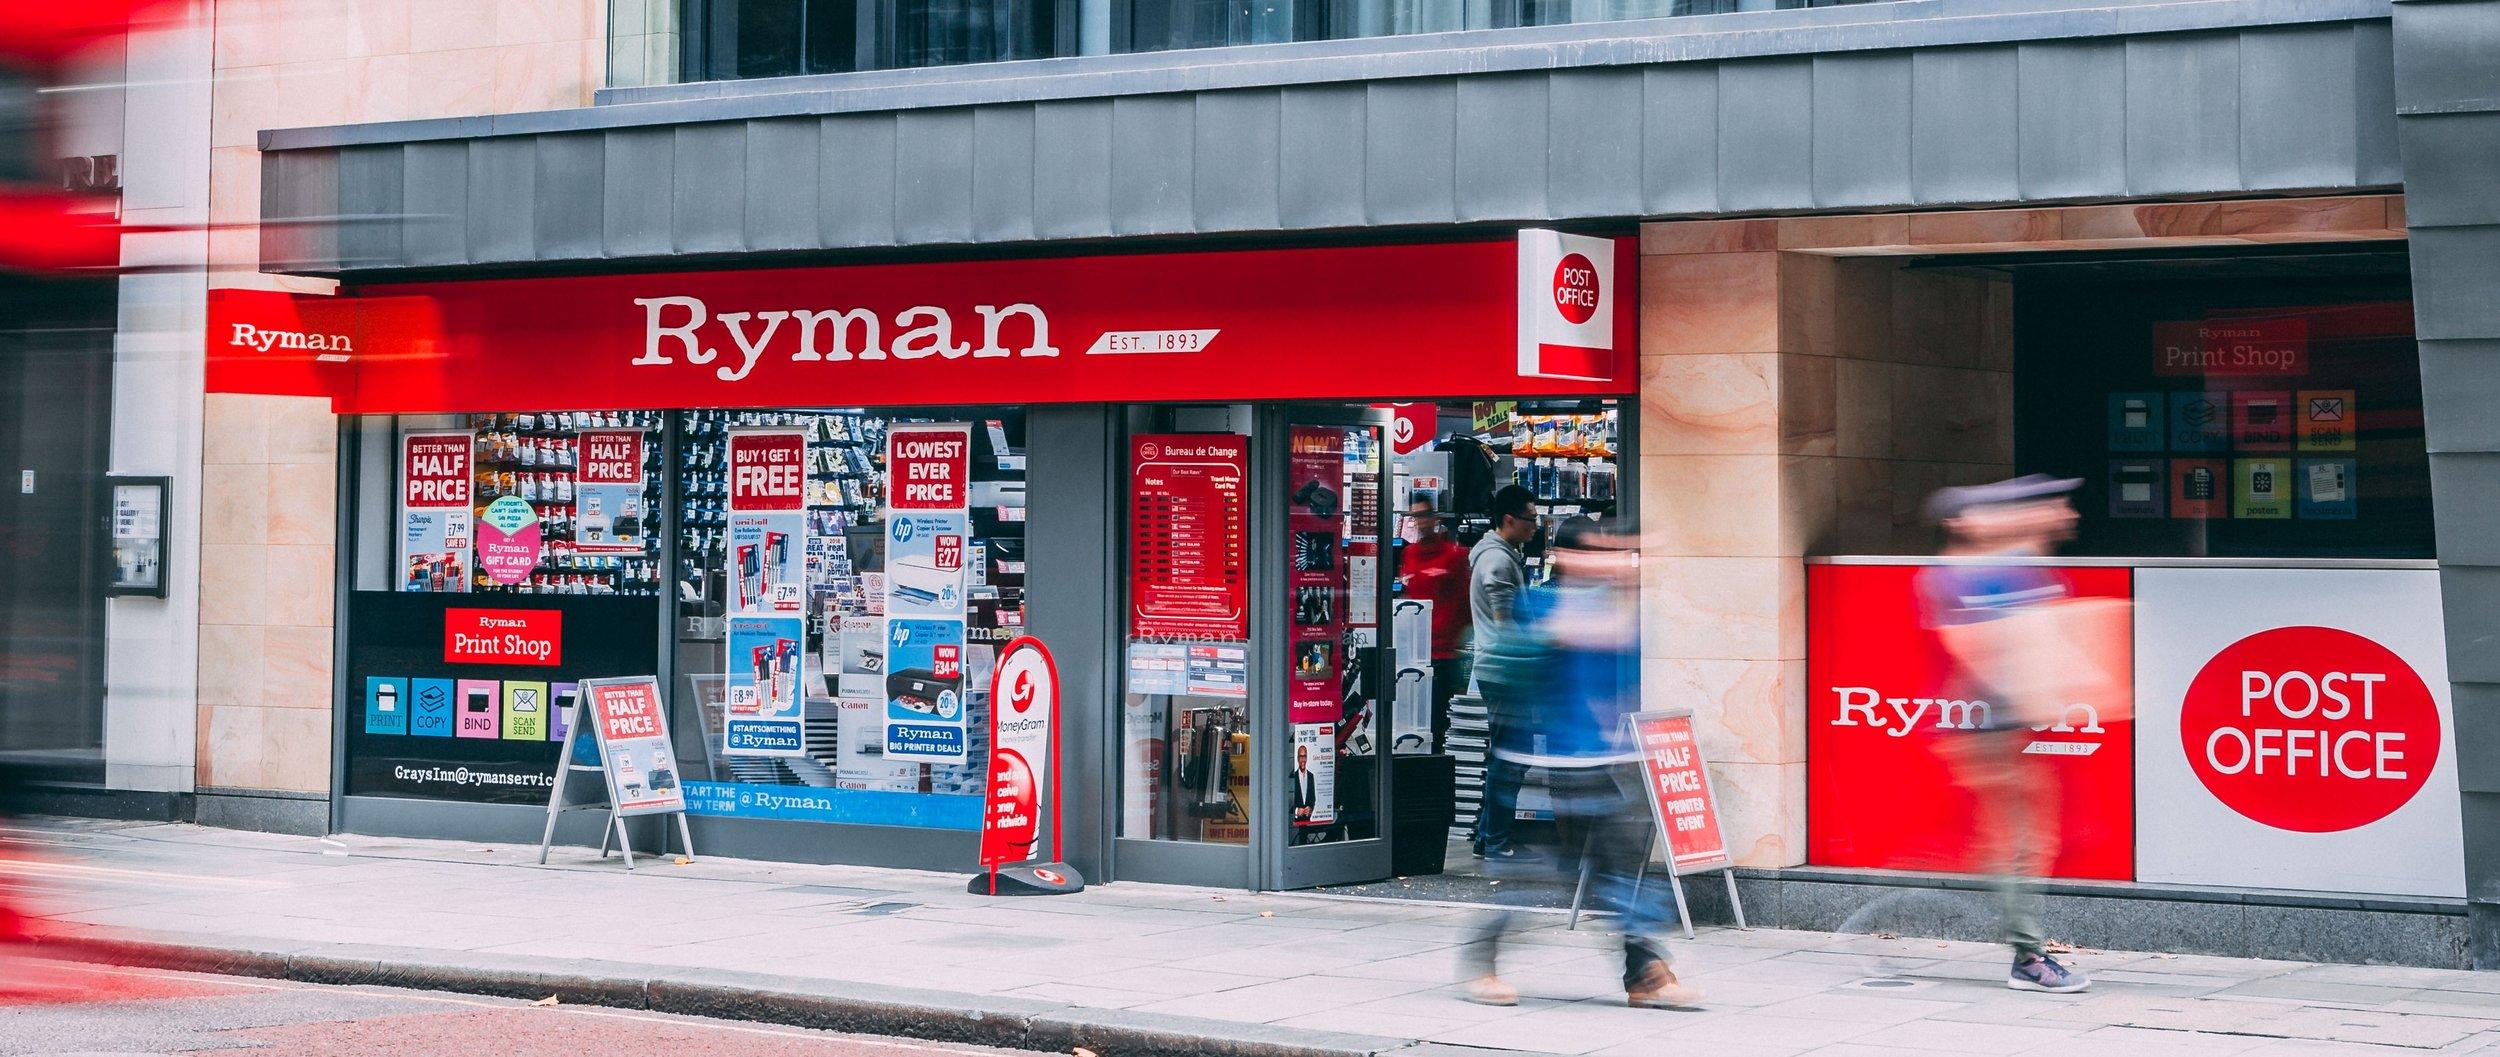 Ryman_Grays_Inn_Rd-18-2-cropped-with-paint.jpg